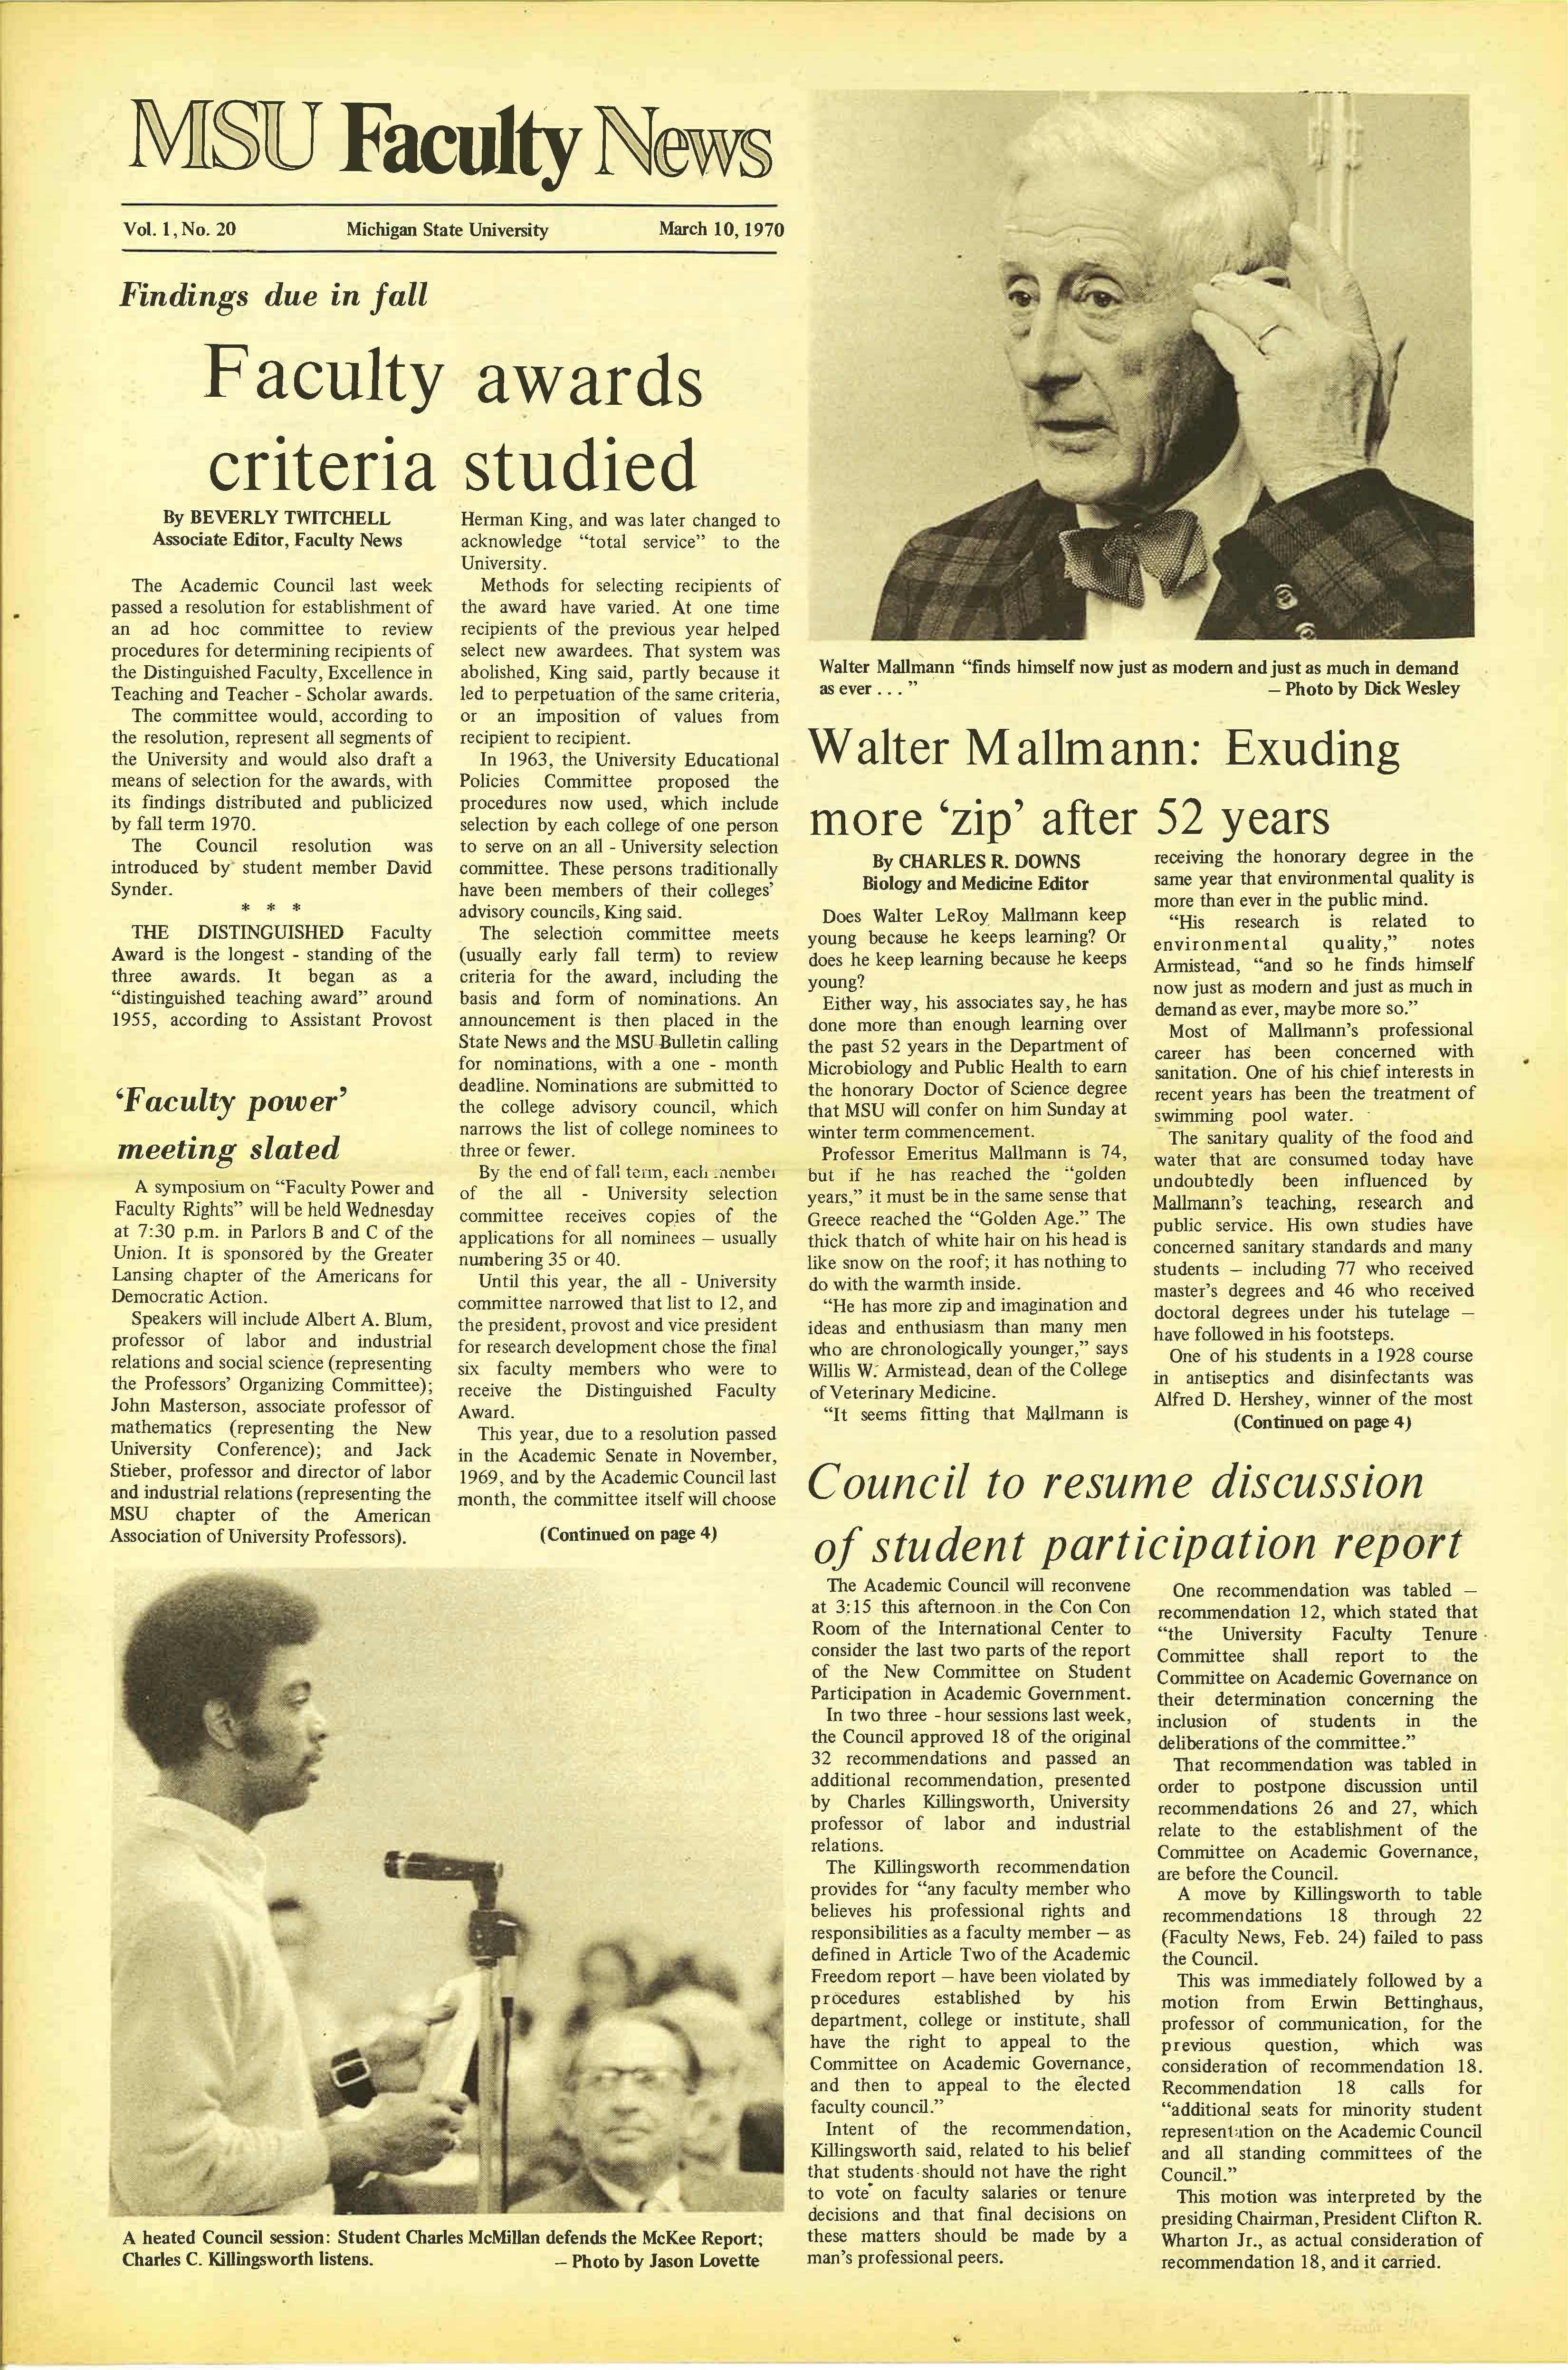 MSU News Bulletin, Vol. 1 No. 20, March 10, 1970